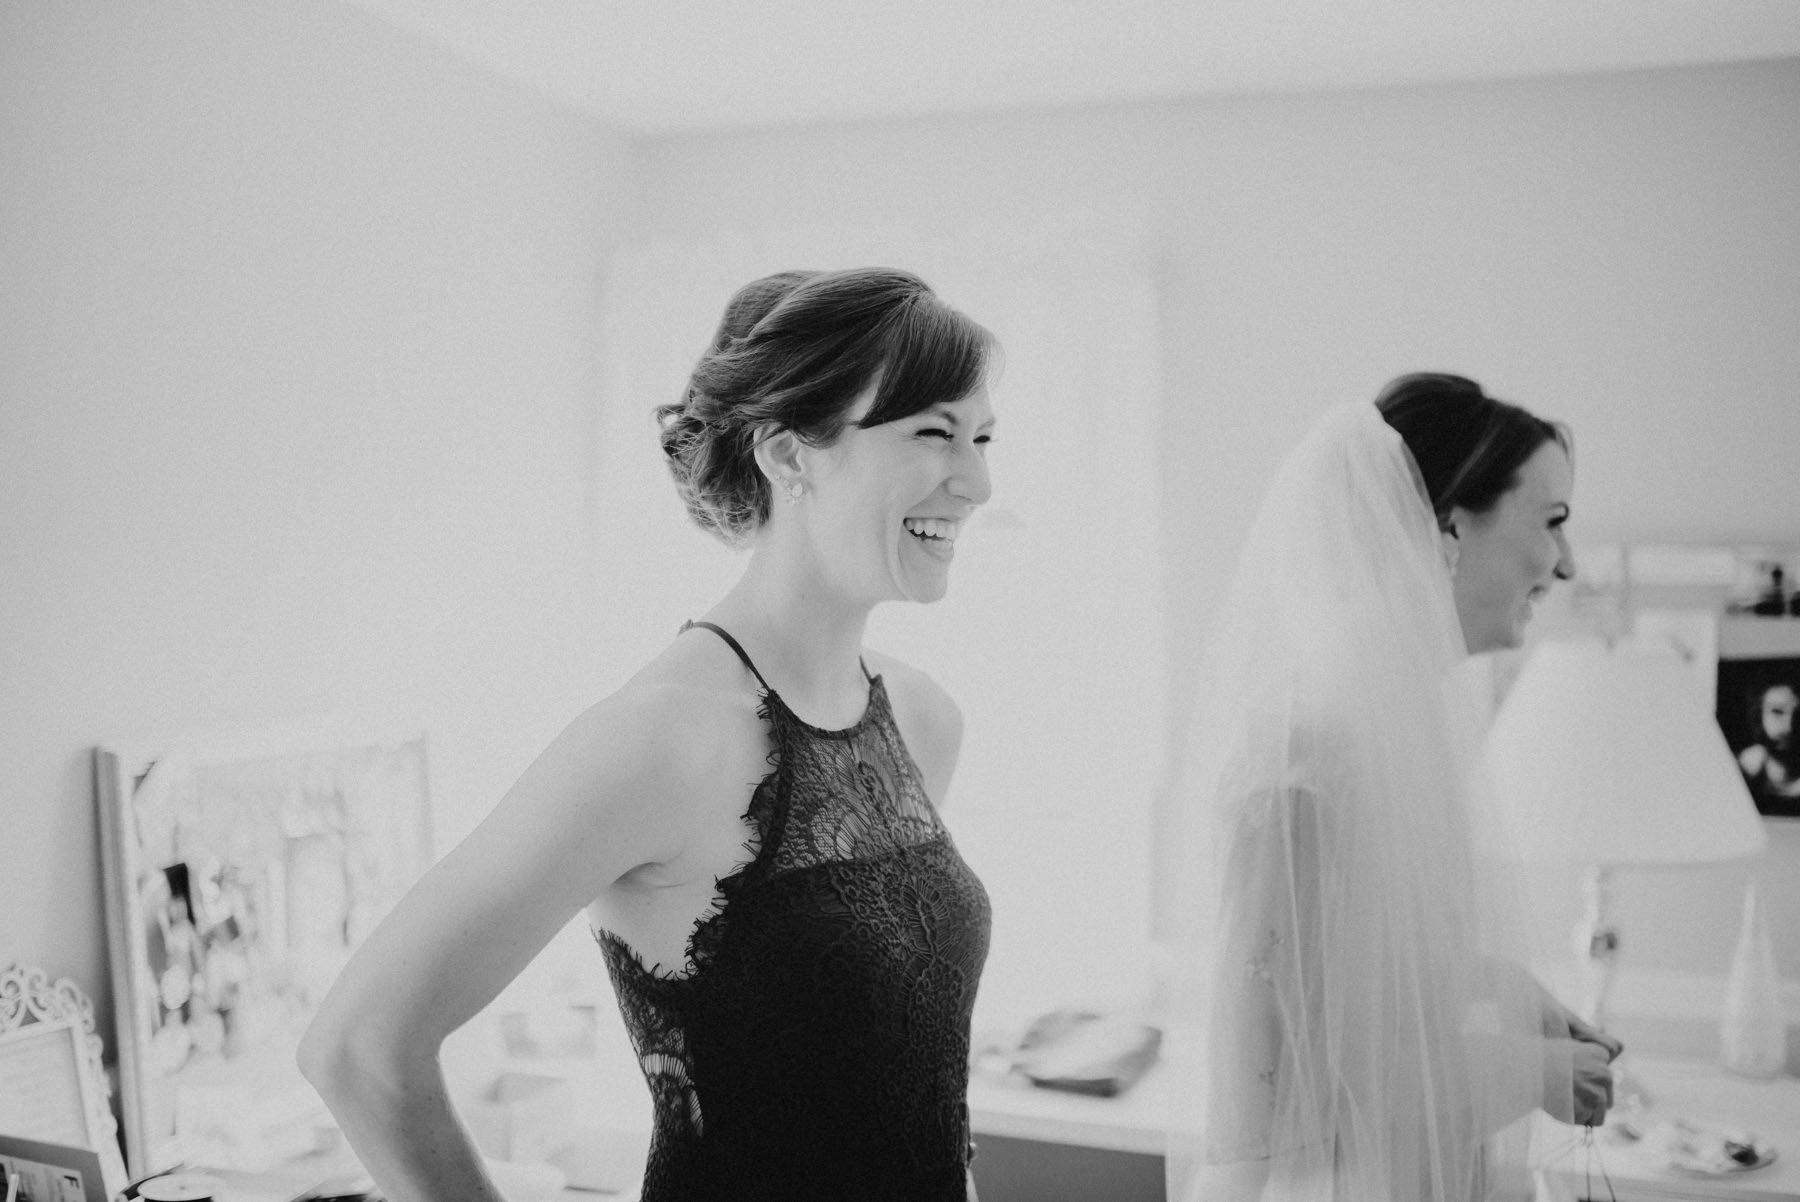 faunbrook-bed-and-breakfast-wedding-25.jpg